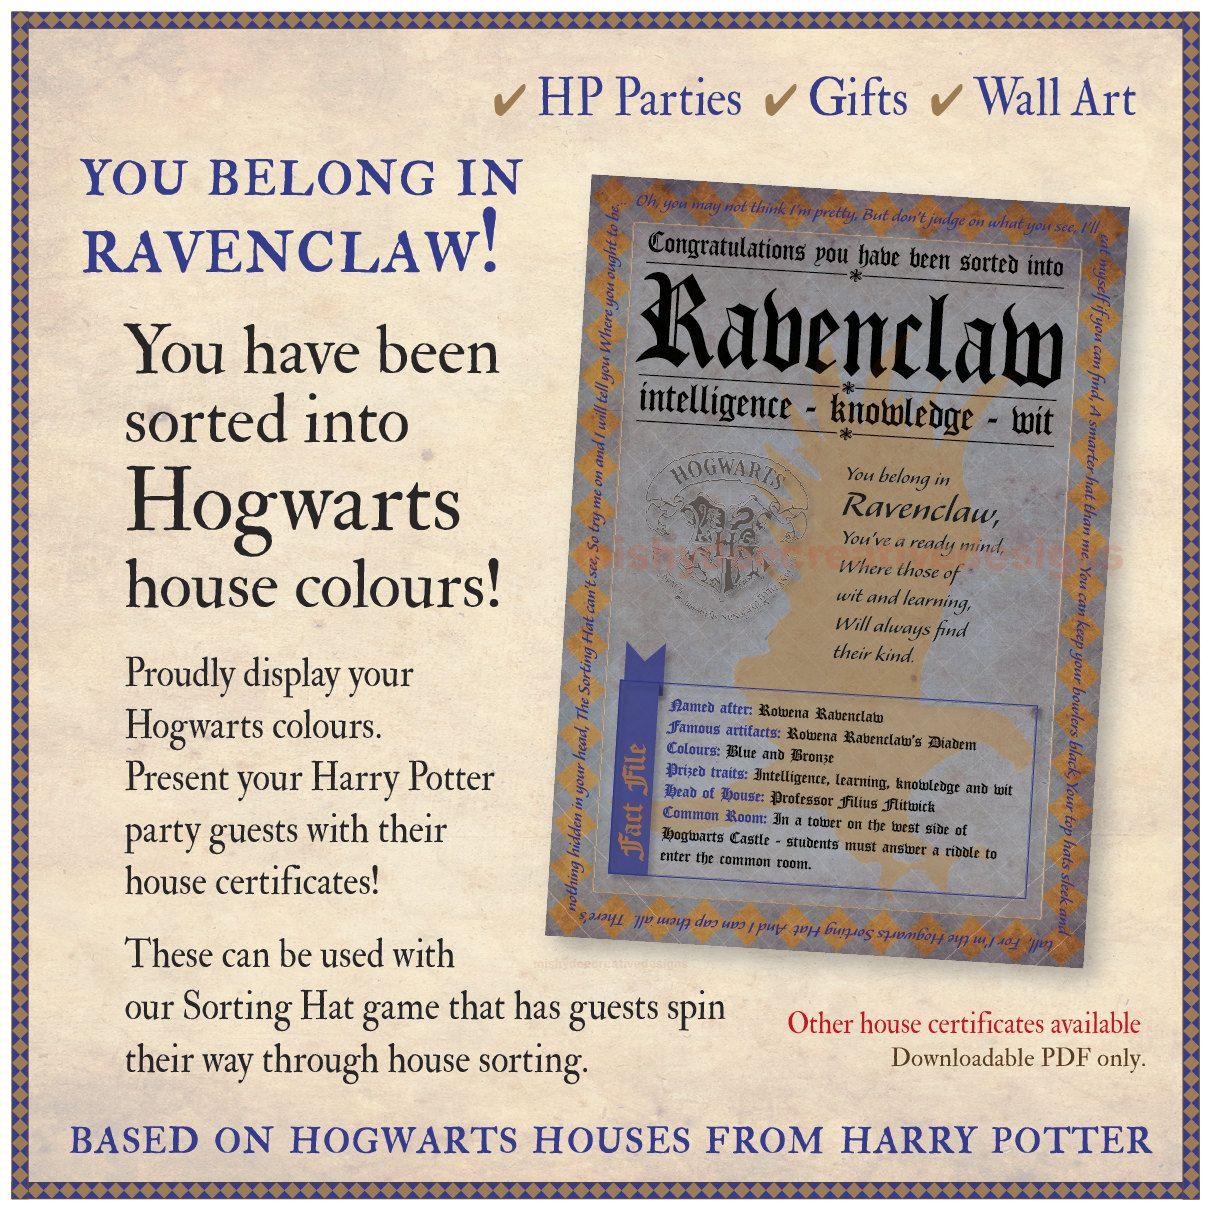 Pin Oleh Rose Harry Potter Di Sertifikat Hogwarts